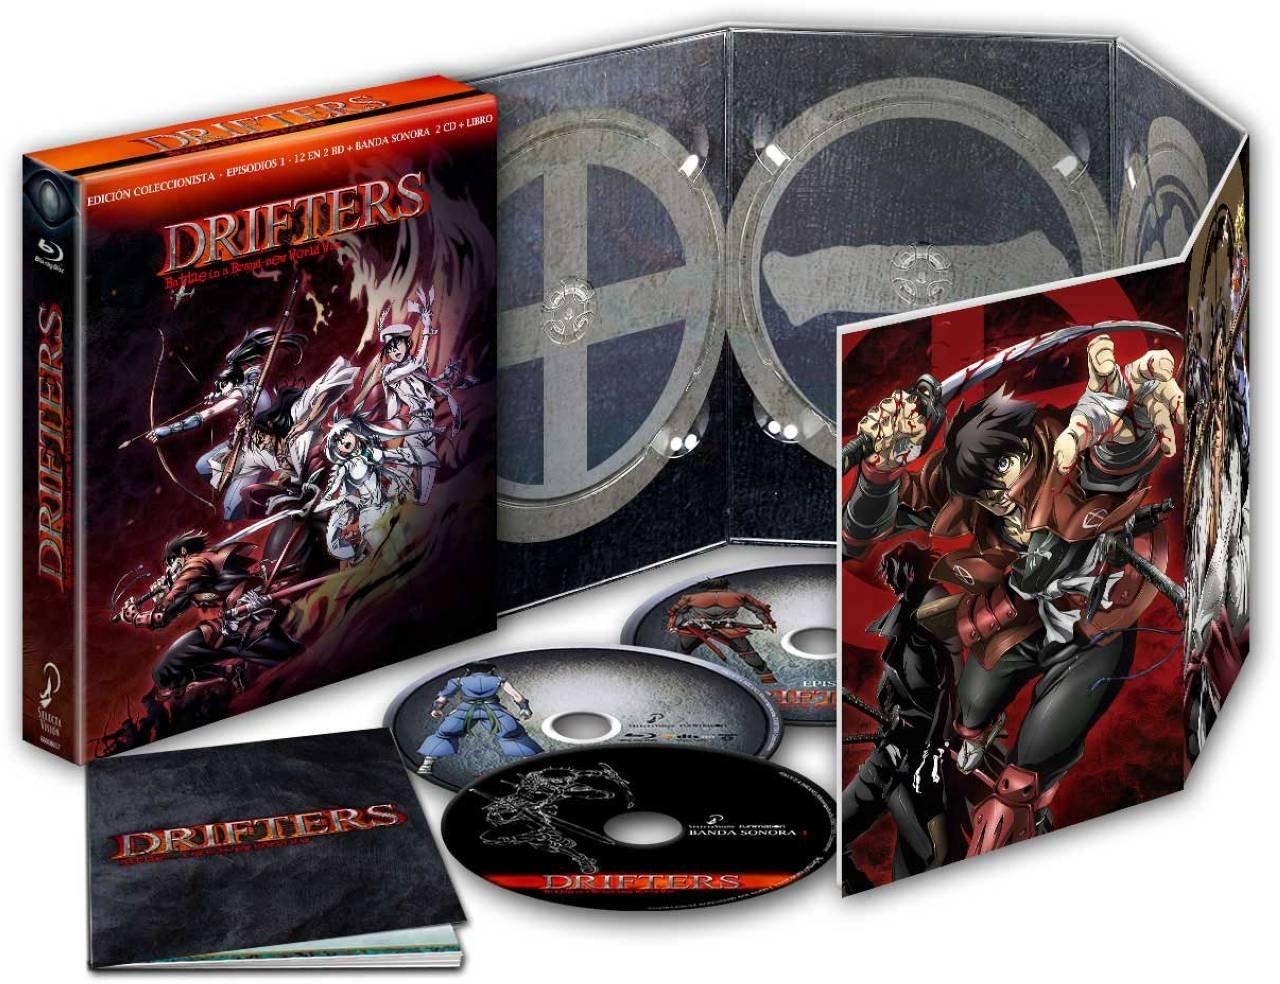 Drifters Temporada 1 en Blu-ray